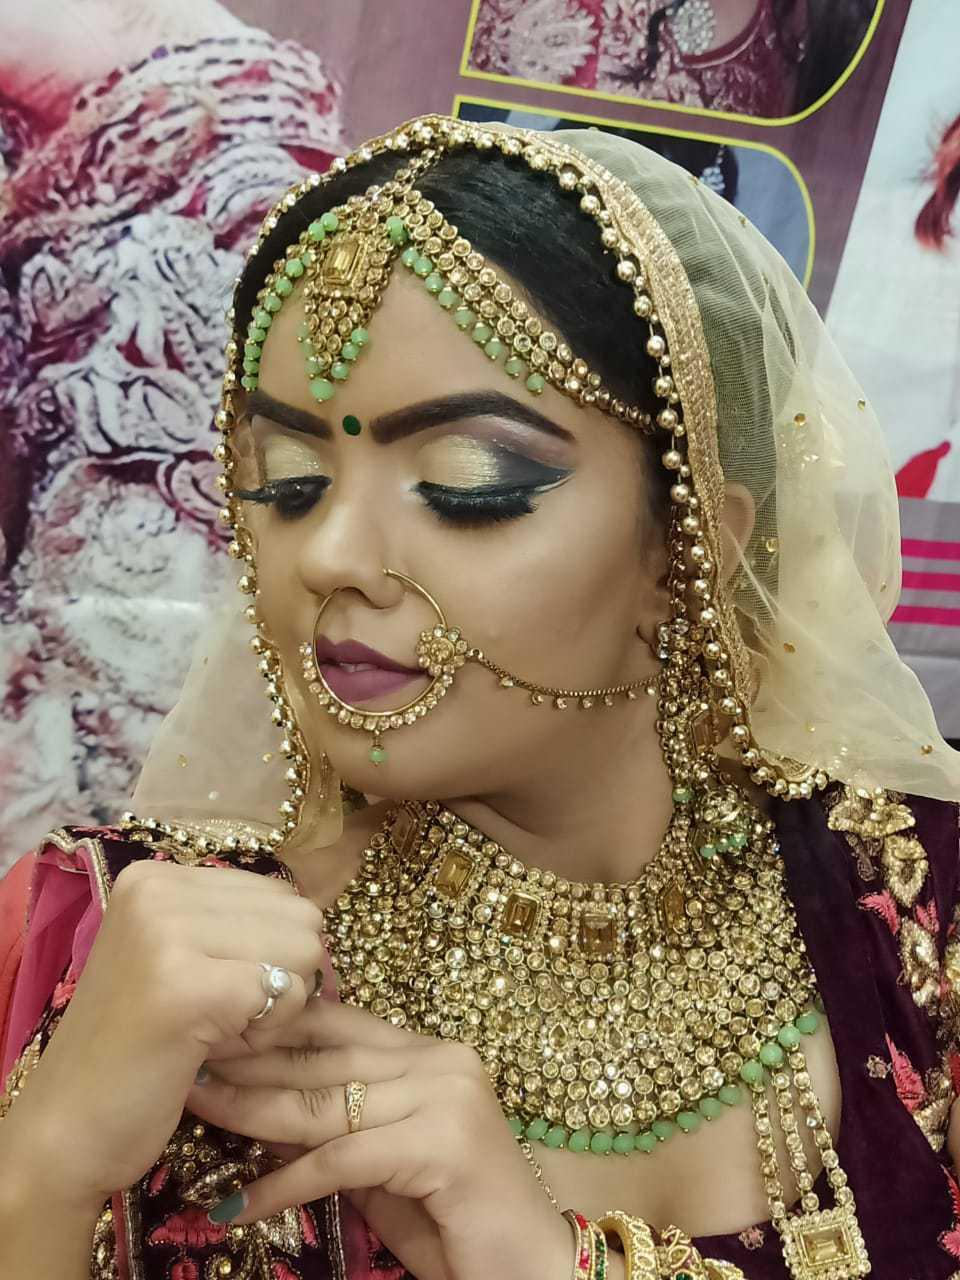 Sakshi Beauty Parlour In Sector 22 Gurgaon 122022 Sulekha Gurgaon